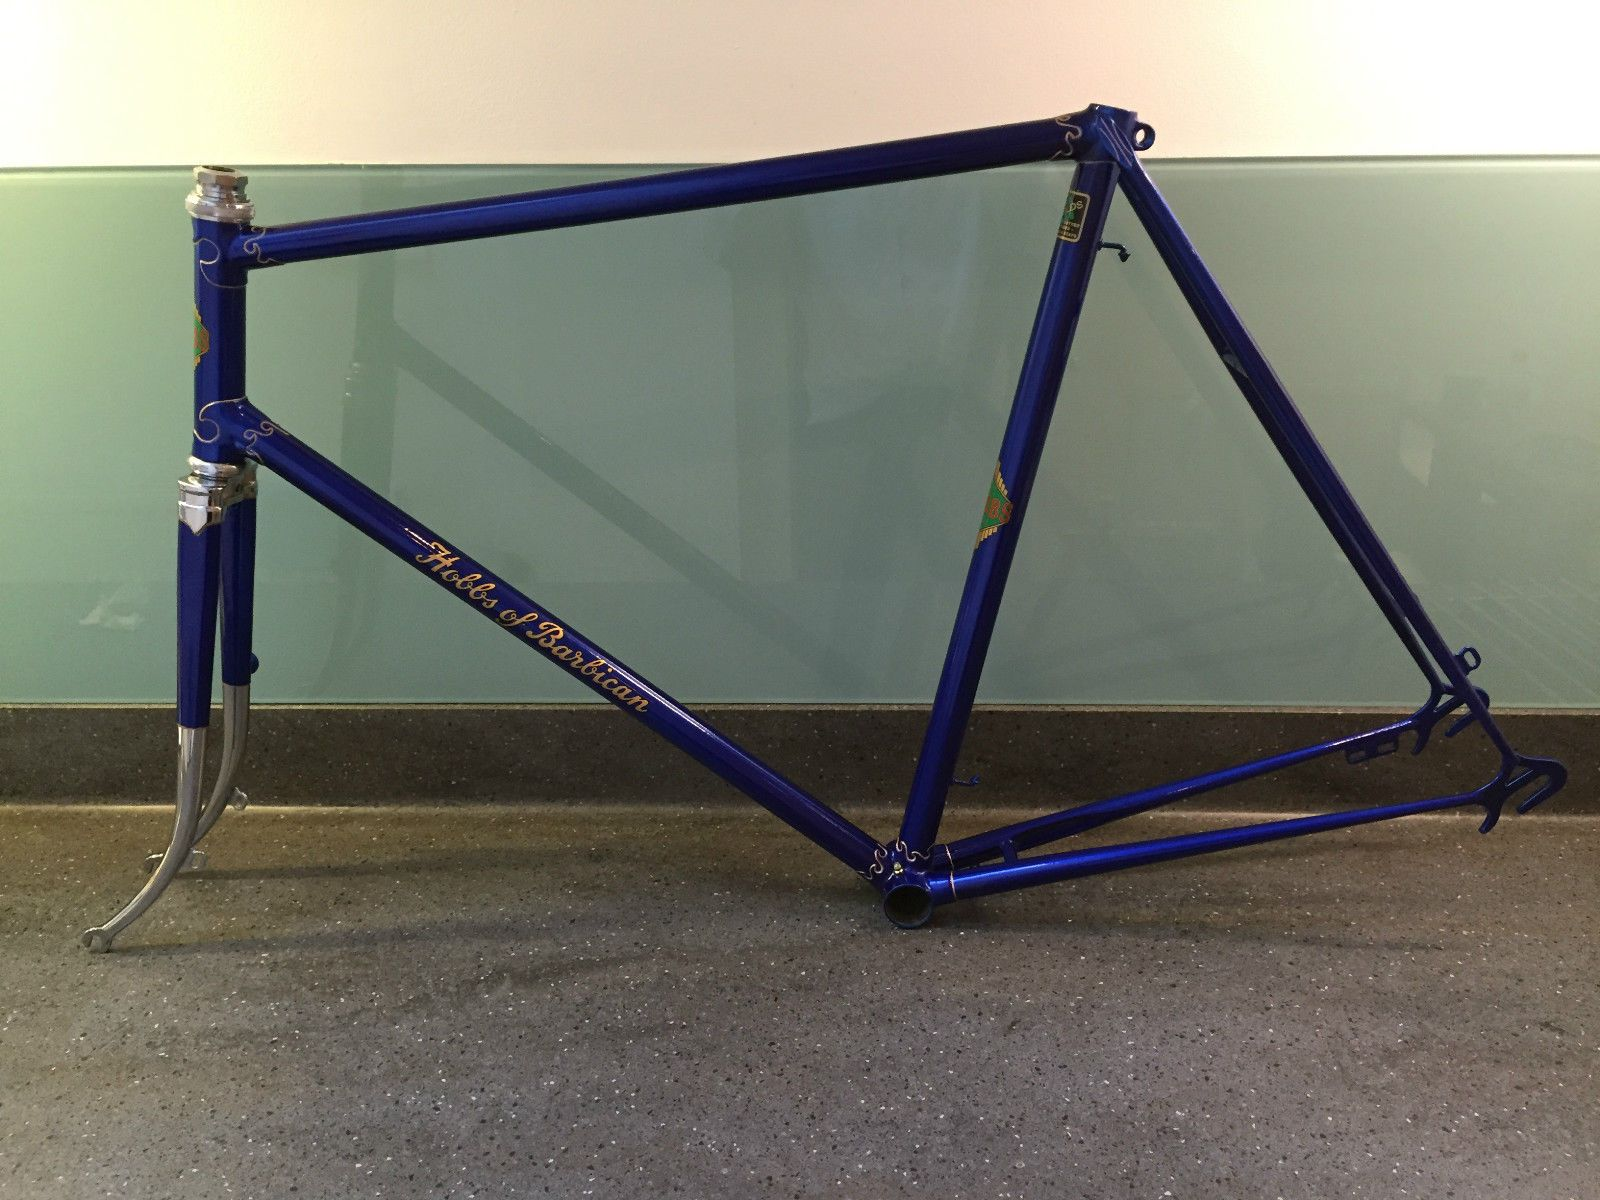 hobbs of barbican superbe vintage reynolds 531 road frame 1946 mint in sporting goods cycling bike frames ebay